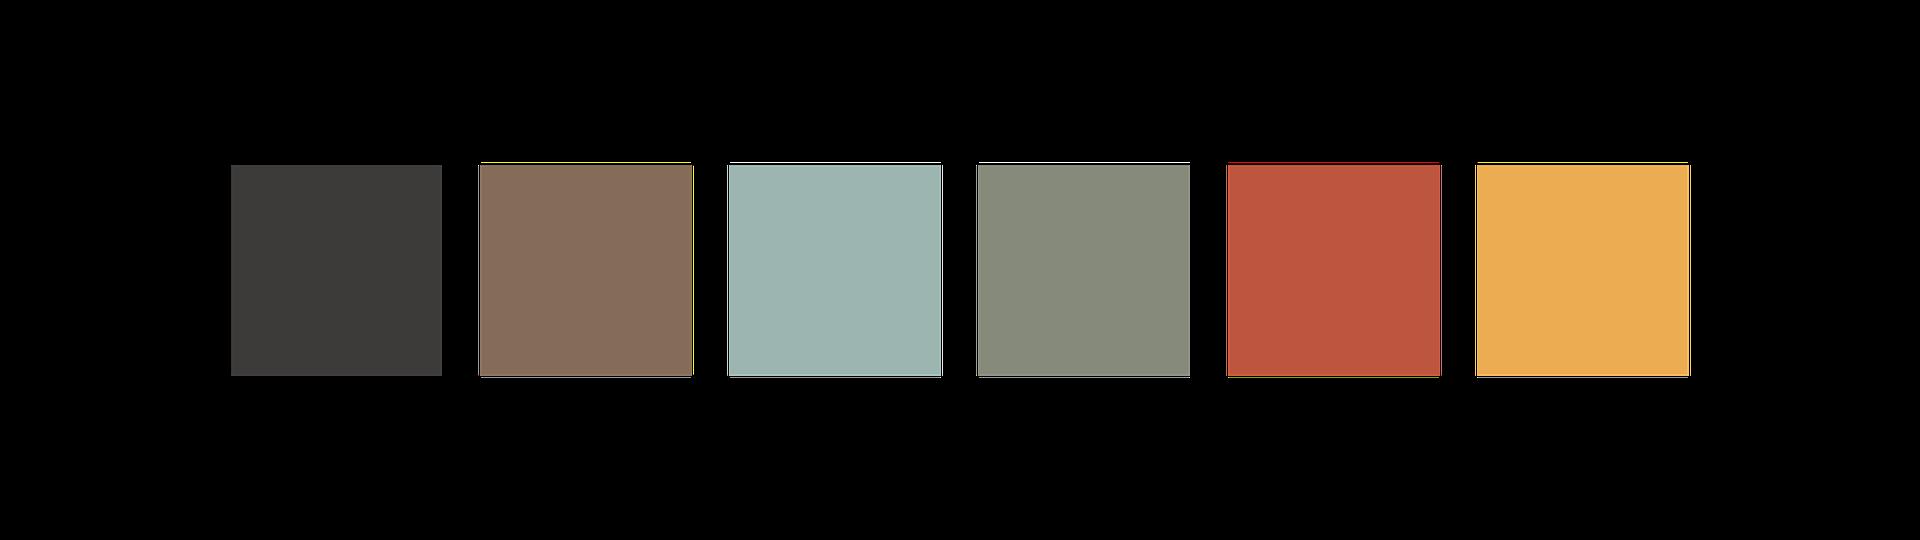 Color Palette: black, brown, light blue, green, orange, yellow